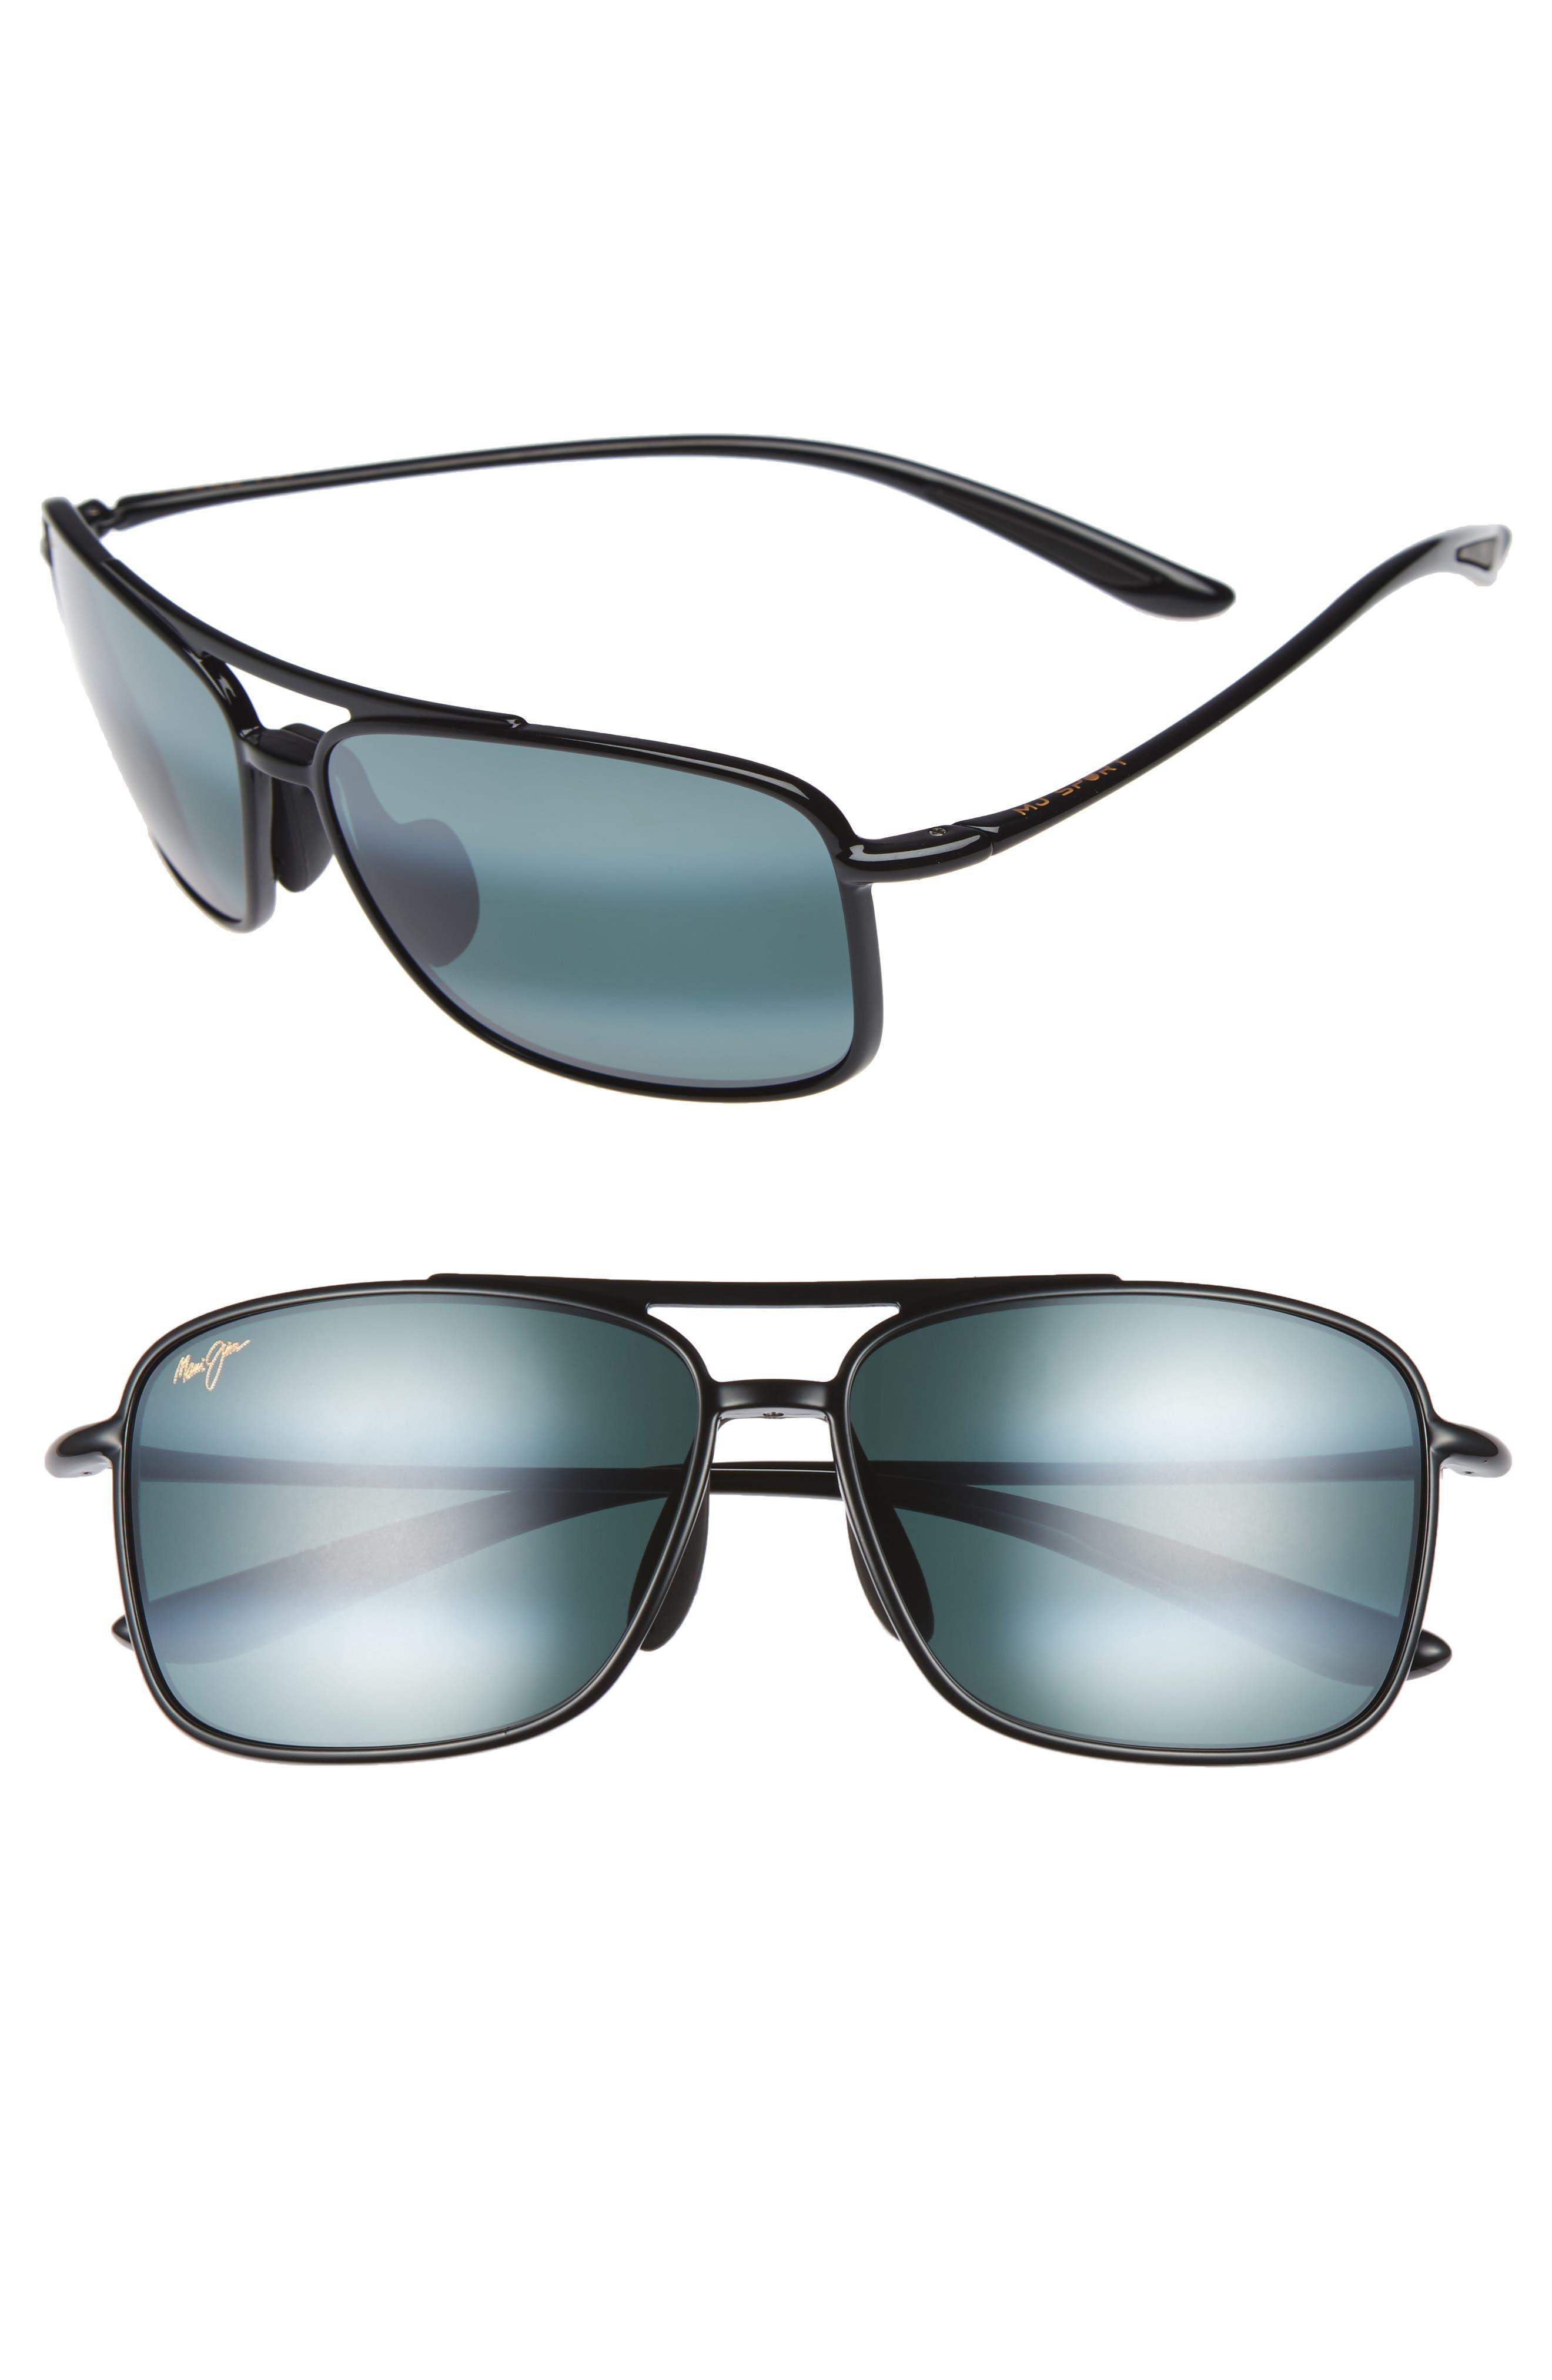 08540f1c74f7 Maui Jim Kaupo Gap 61Mm Polarizedplus2 Sunglasses - Gloss Black/ Neutral  Grey